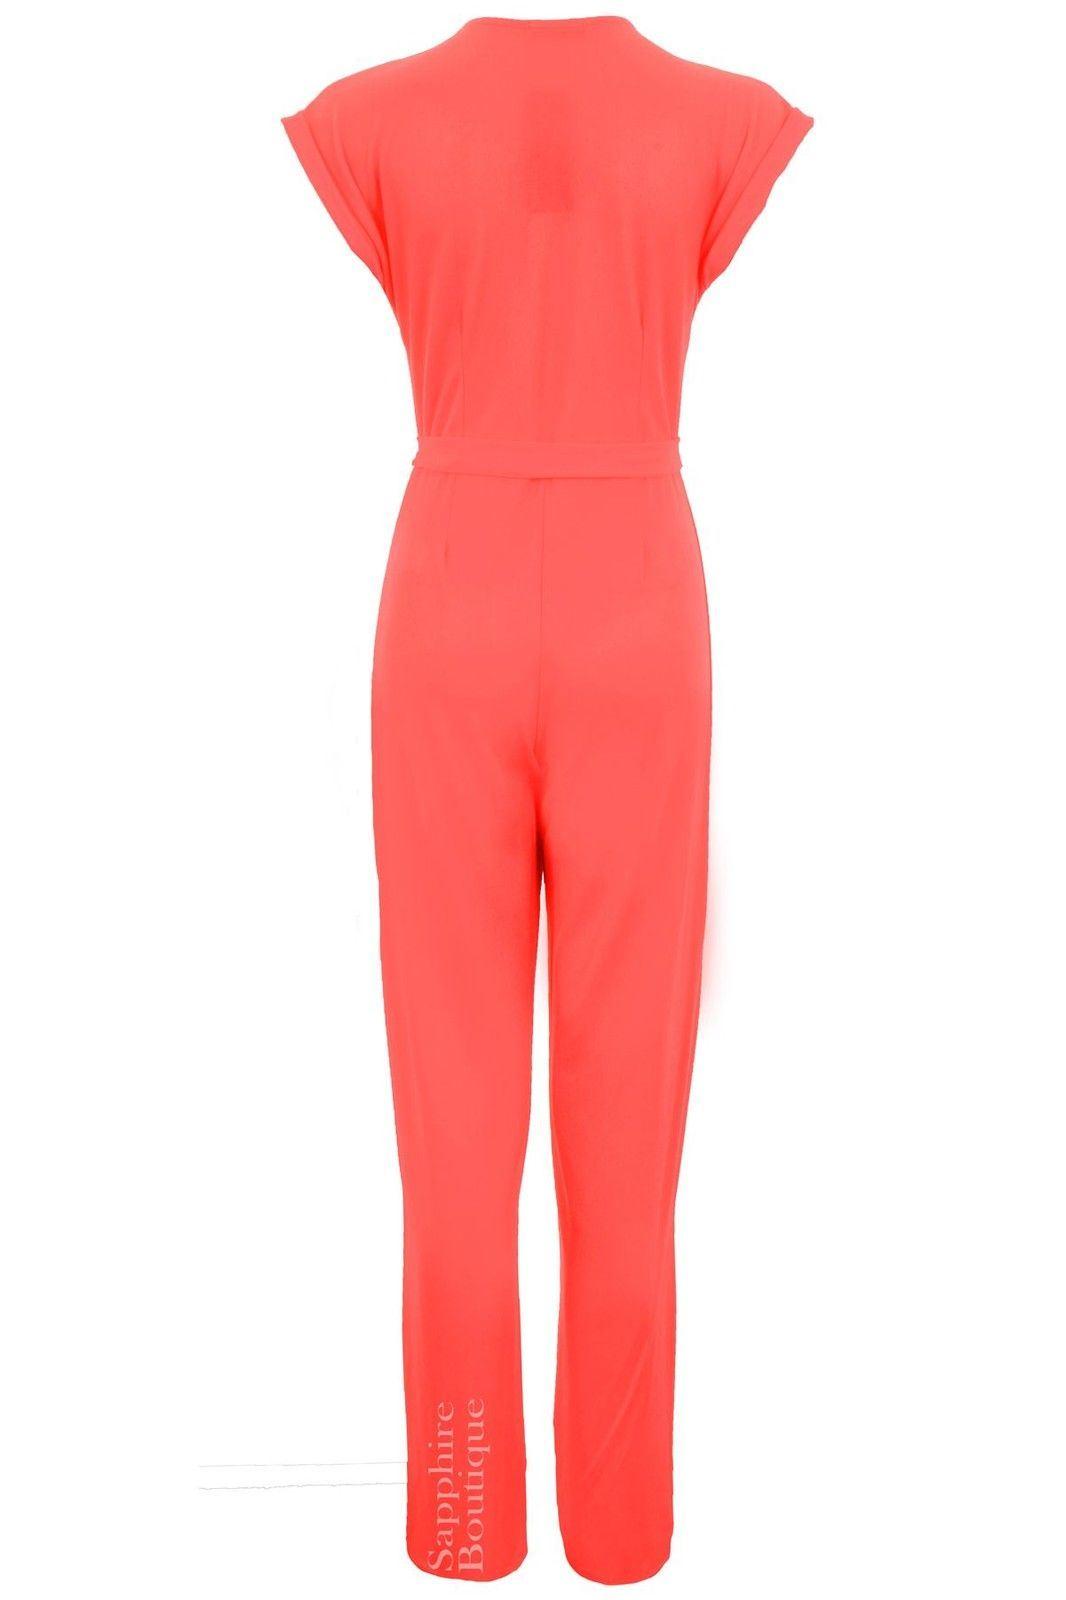 Women's Low V Neck Turn Up Cap Sleeve Crepe Ladies Wrap Front Jumpsuit